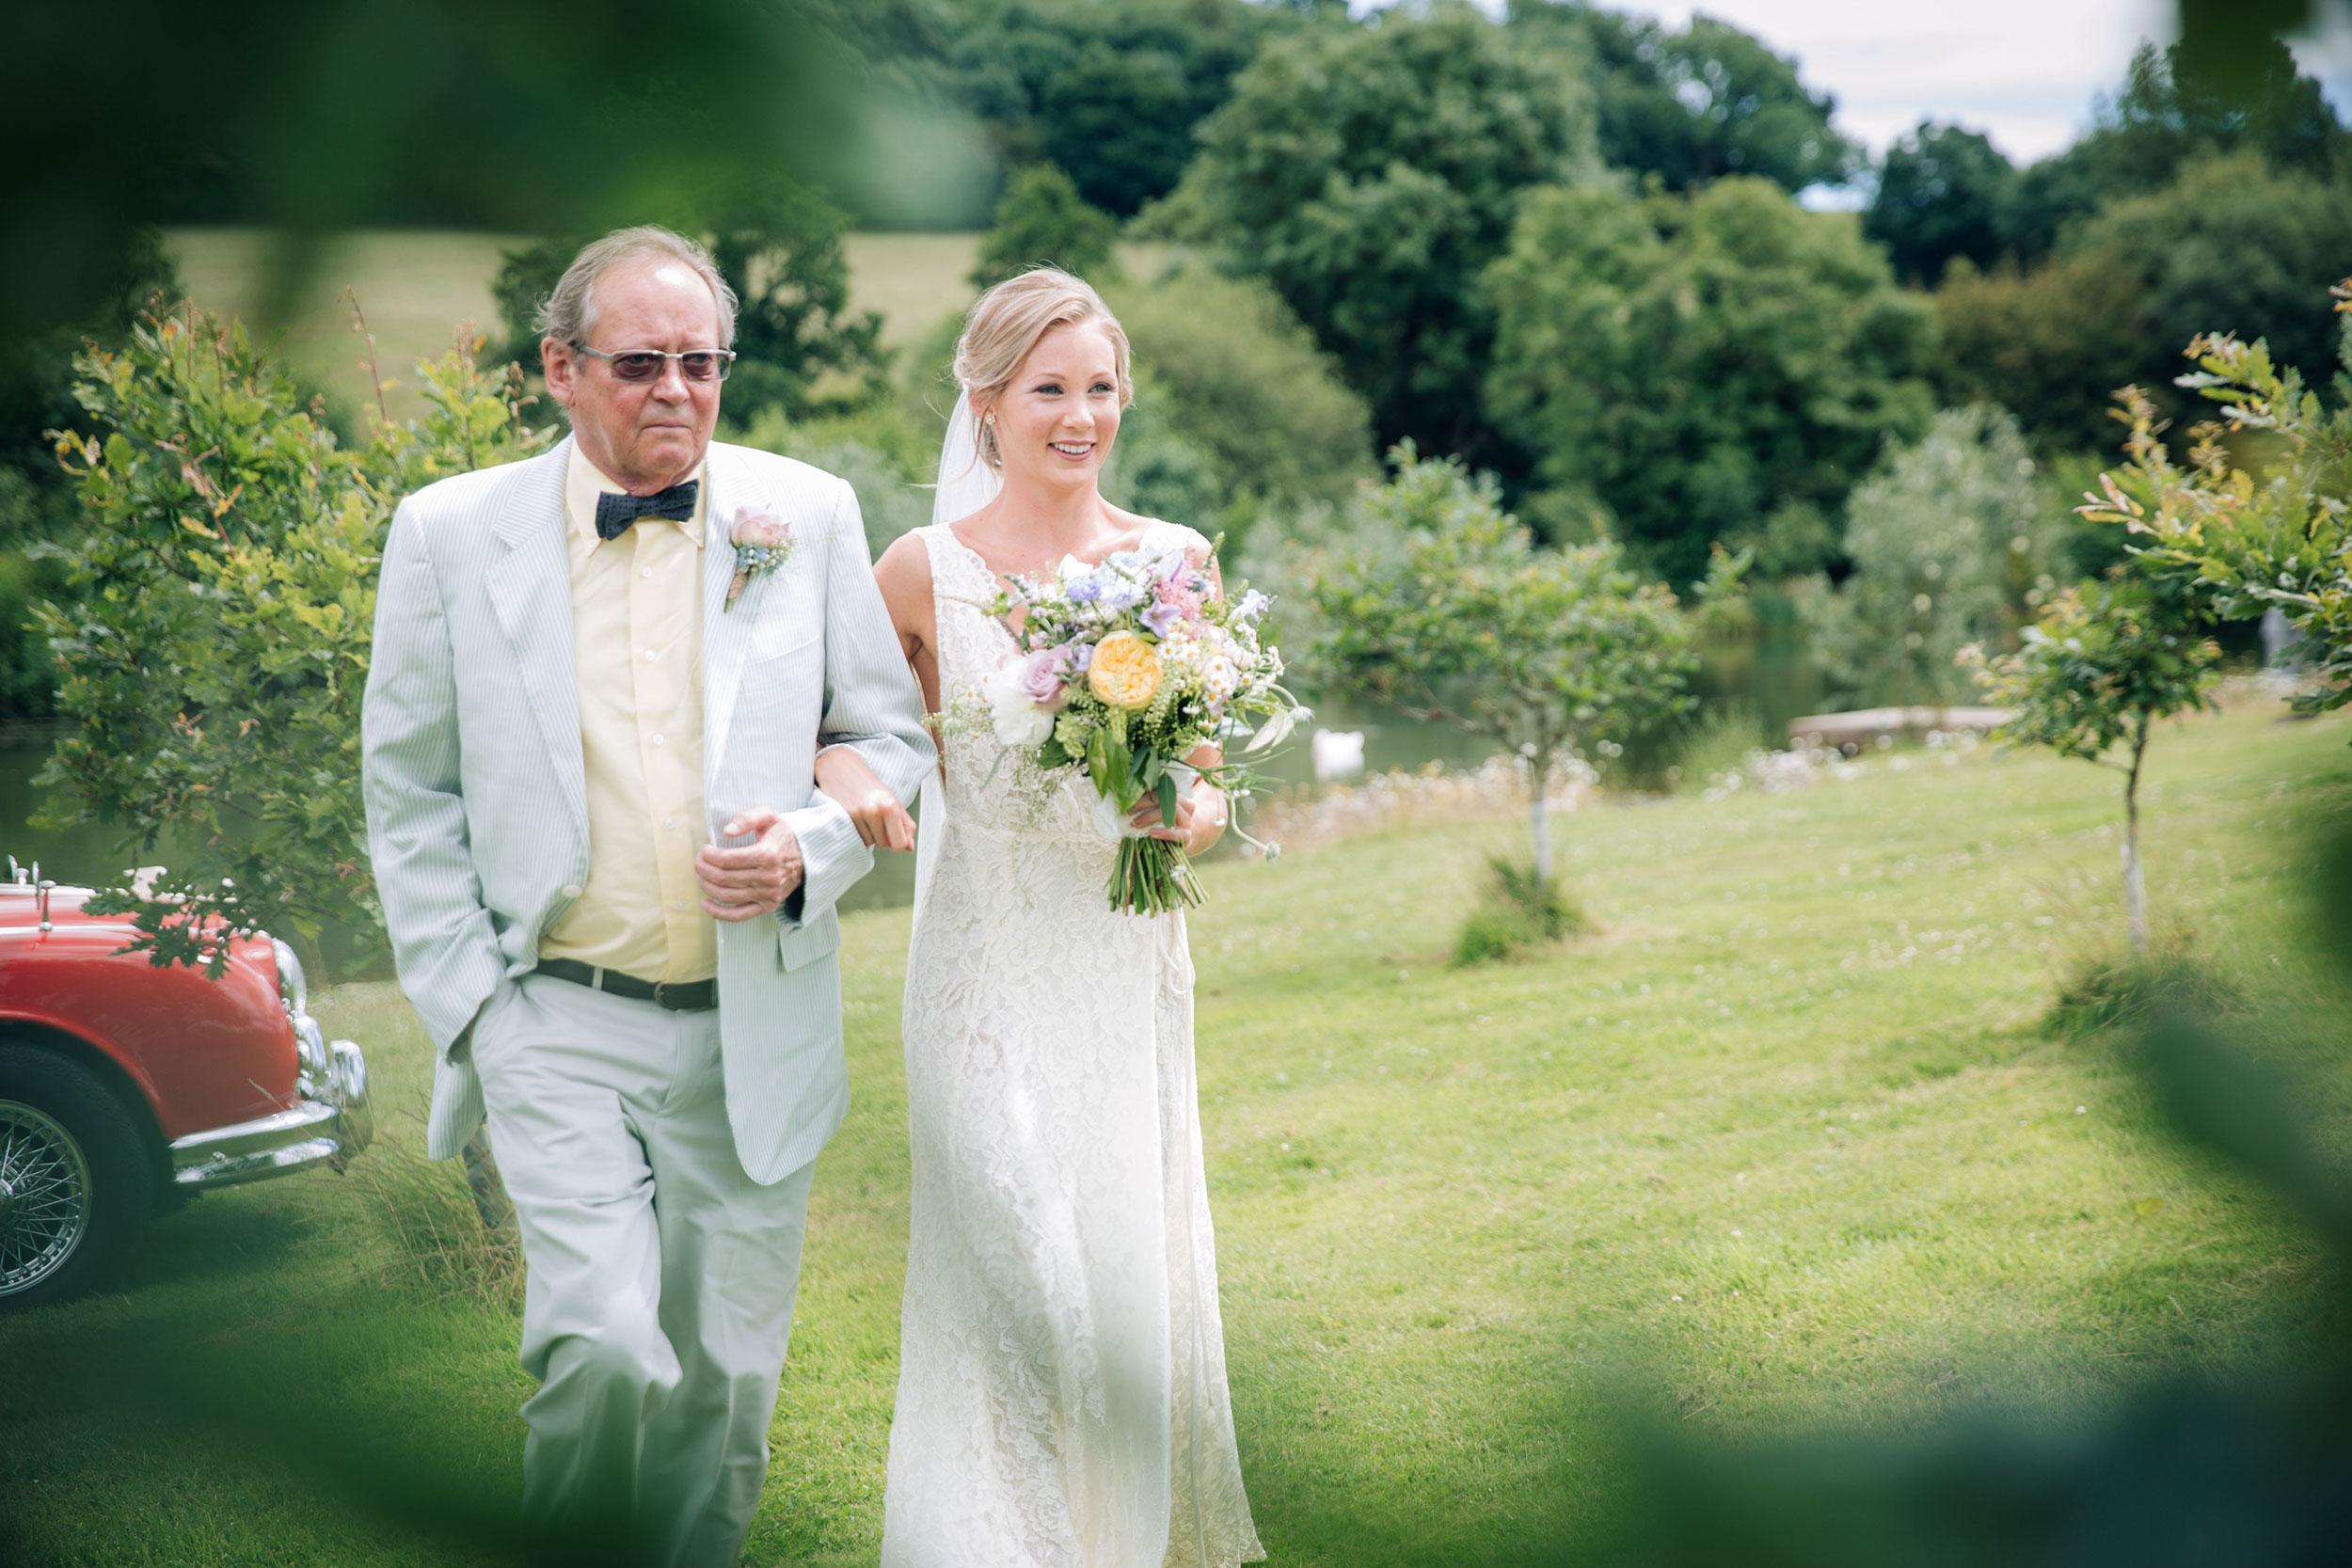 16.07.16-Tanya-&-Jethro-Wedding-Selection-27.jpg